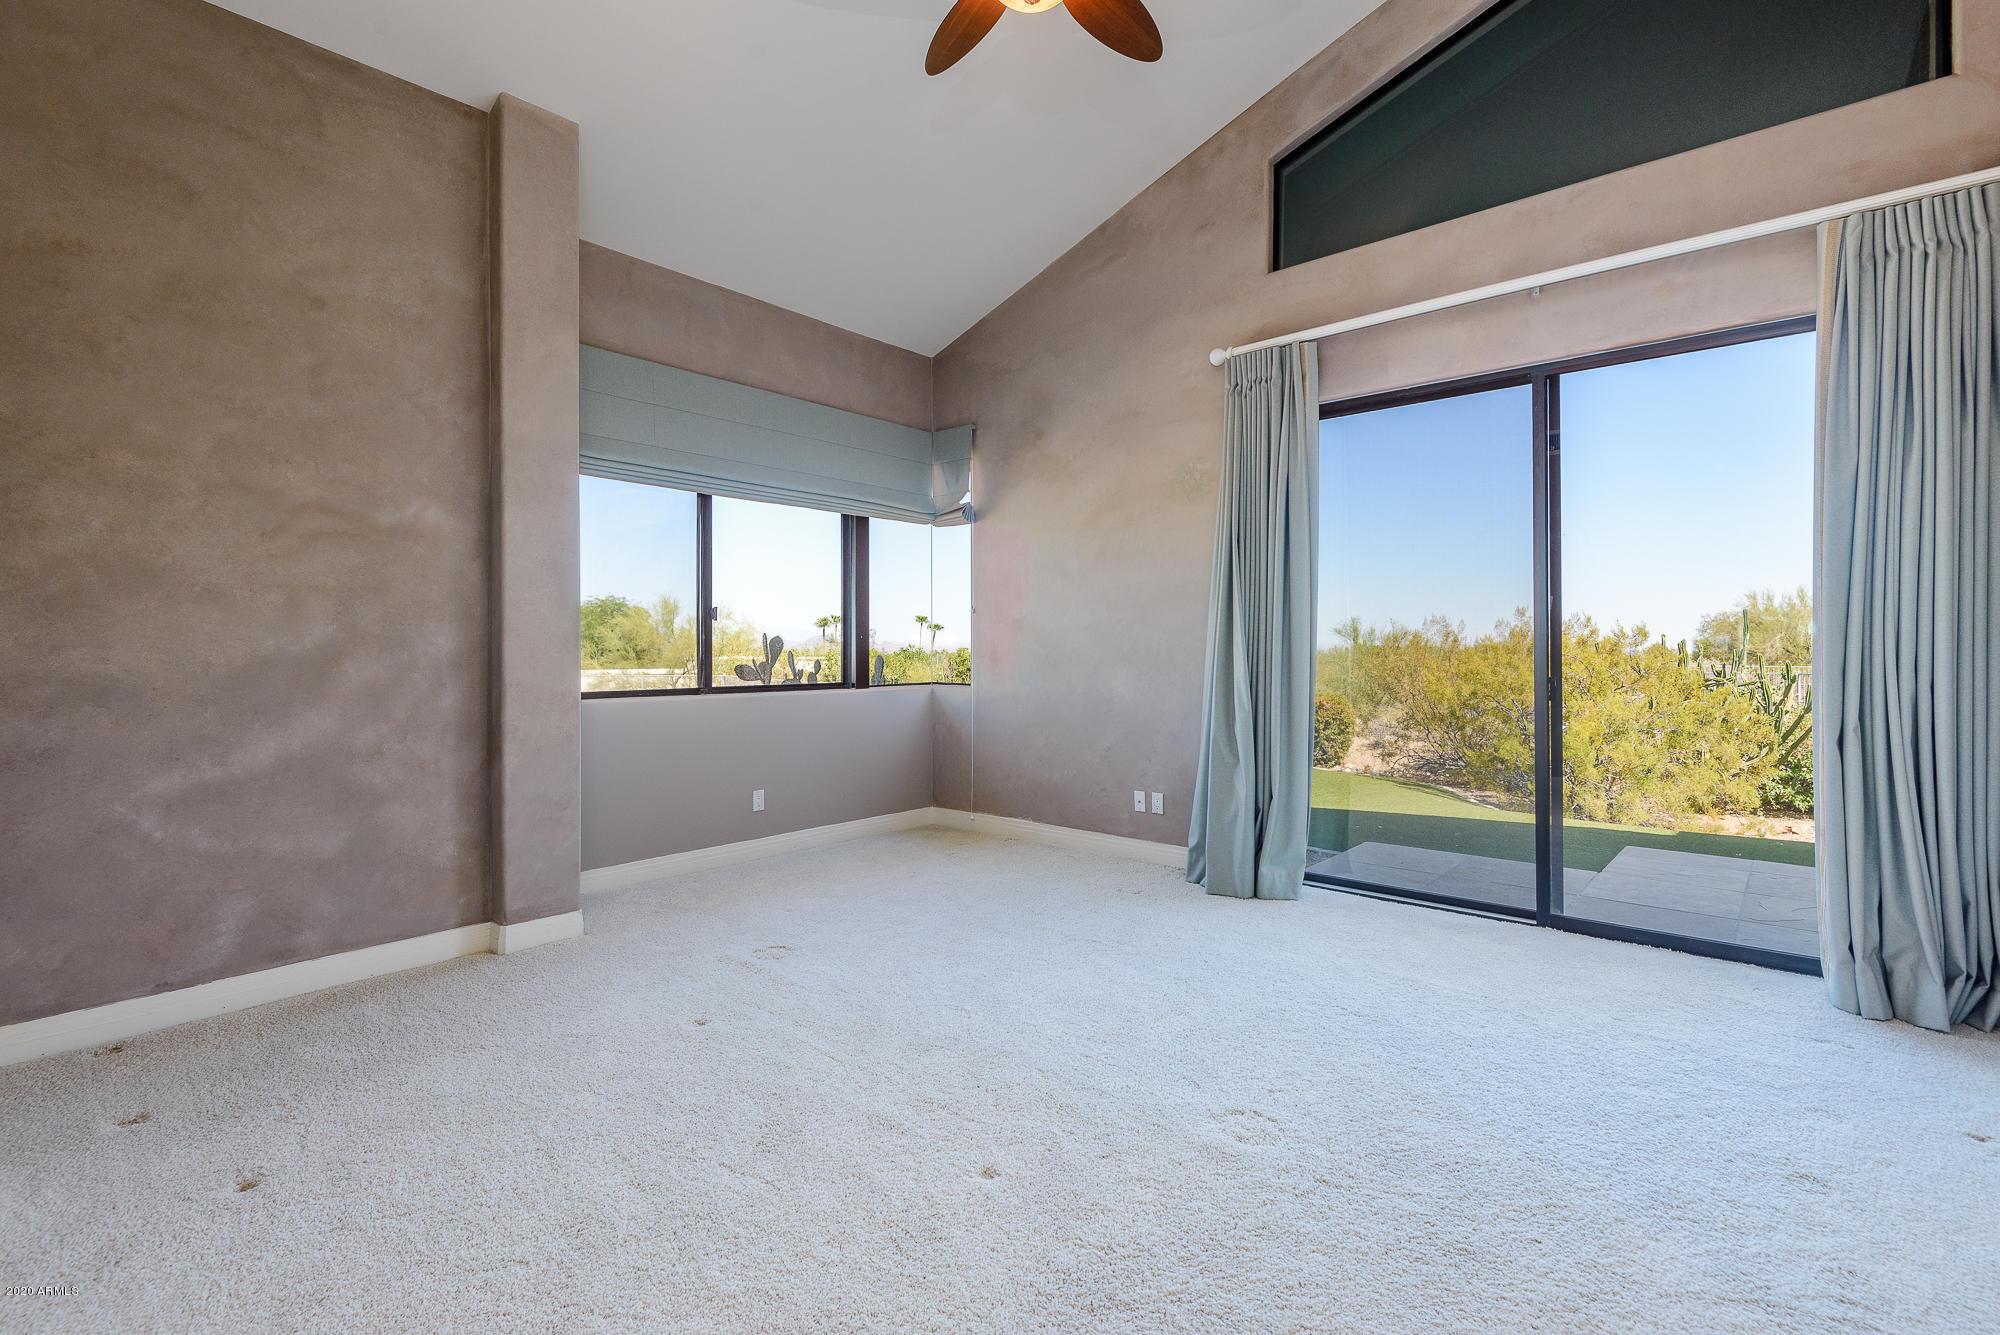 7575 HUMMINGBIRD Lane, Paradise Valley, Arizona 85253, 4 Bedrooms Bedrooms, ,6 BathroomsBathrooms,Residential,For Sale,HUMMINGBIRD,6047669